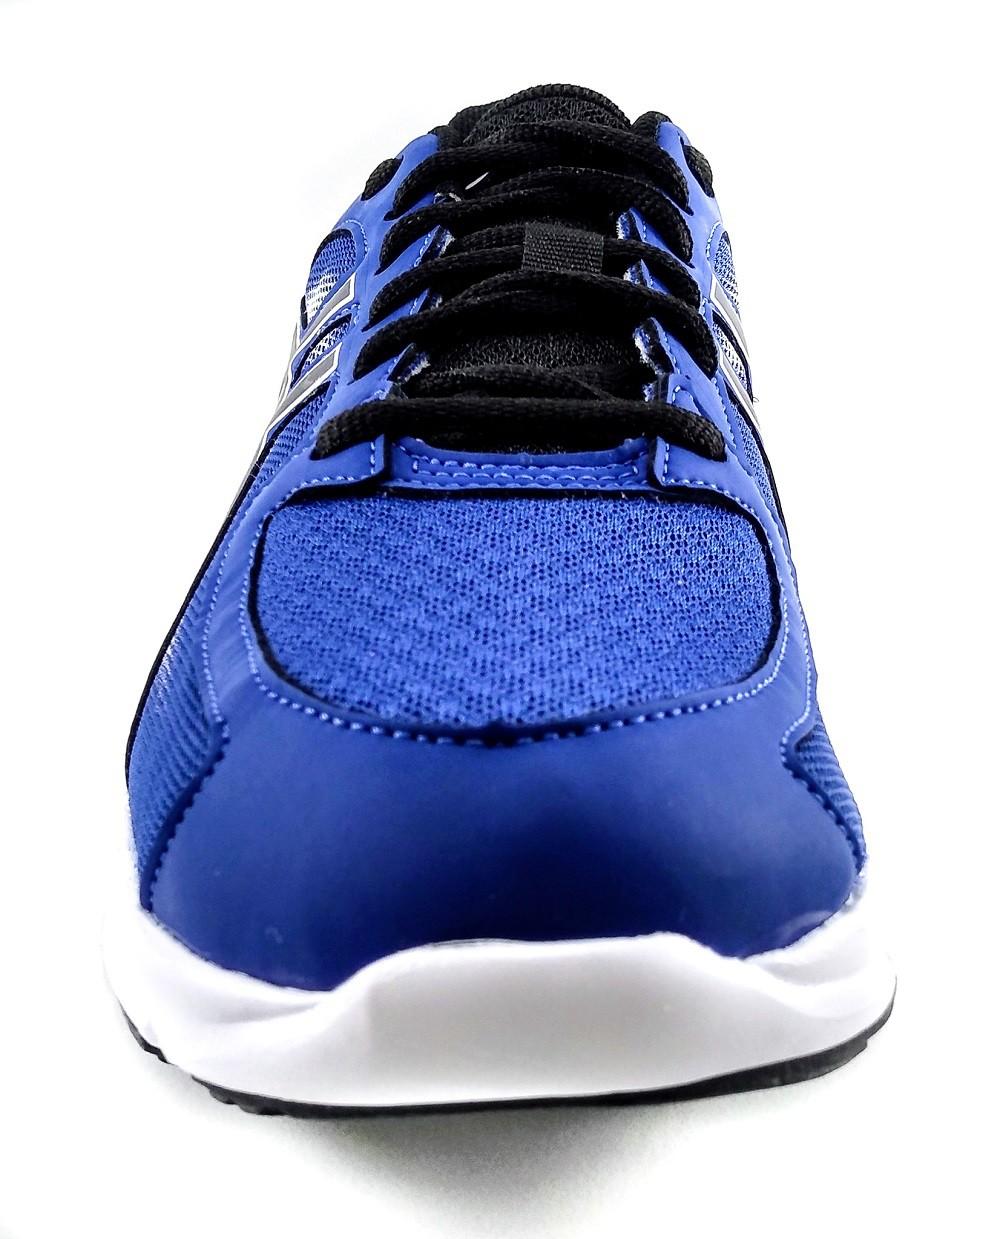 Tênis Asics Gel Transition Masculino Azul e Preto